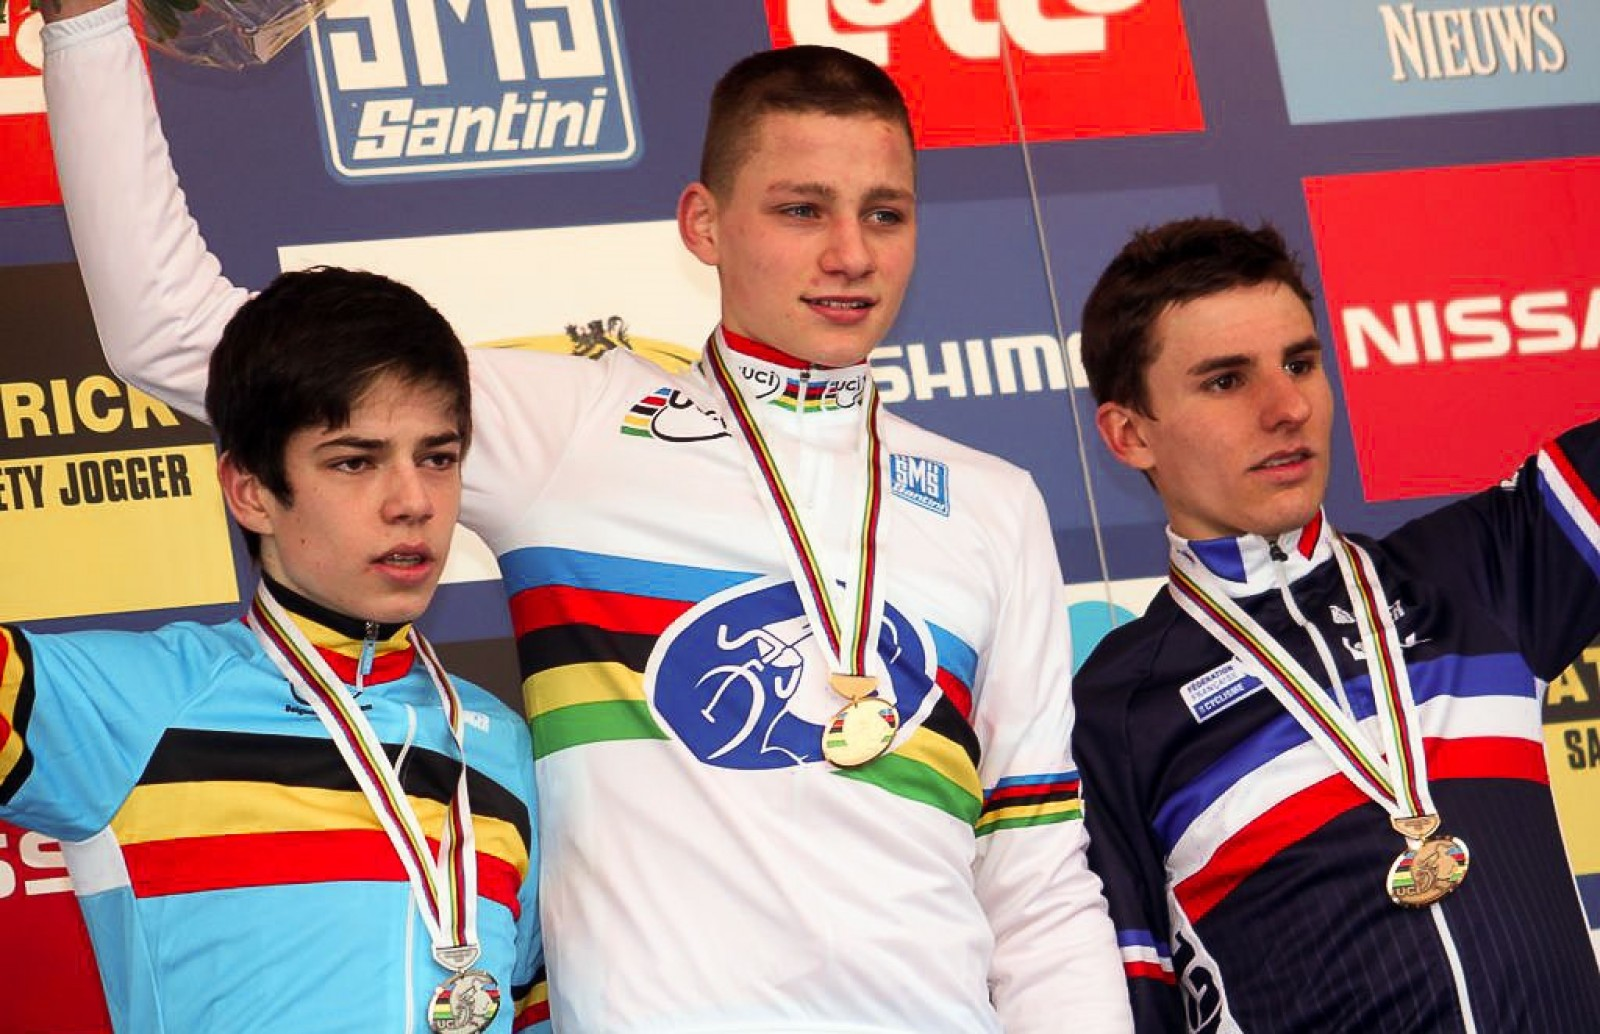 sprint-van-der-poel-flandes/